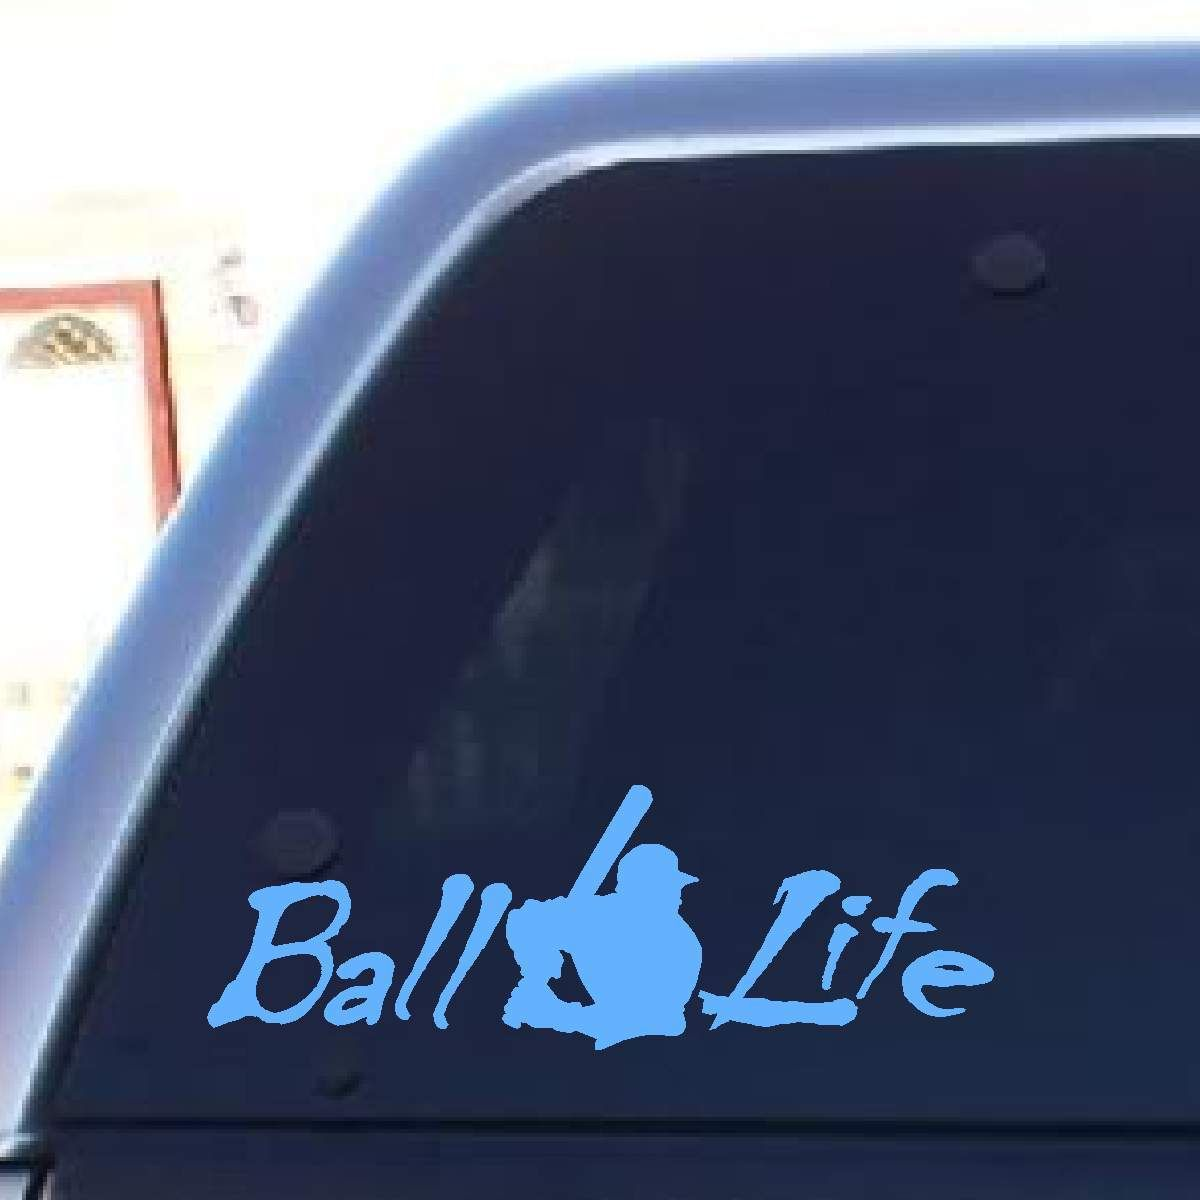 Ball Life Decal Vinyl Decal Projects Baseball Car Decals Baseball Decals [ jpg ]